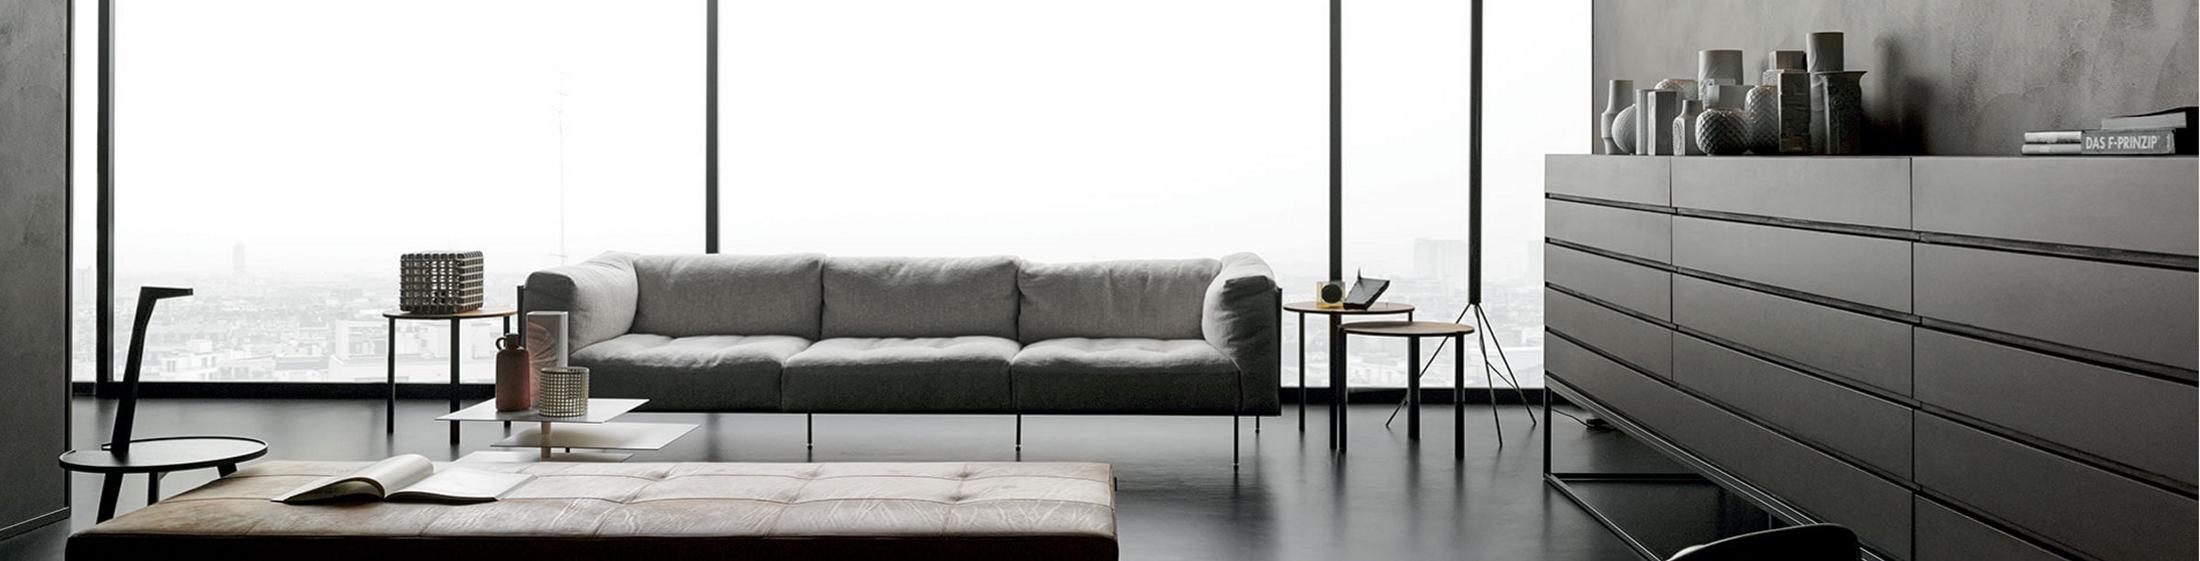 Kerakoll Design House di Manno Impresa Costruzioni Fondi (latina)